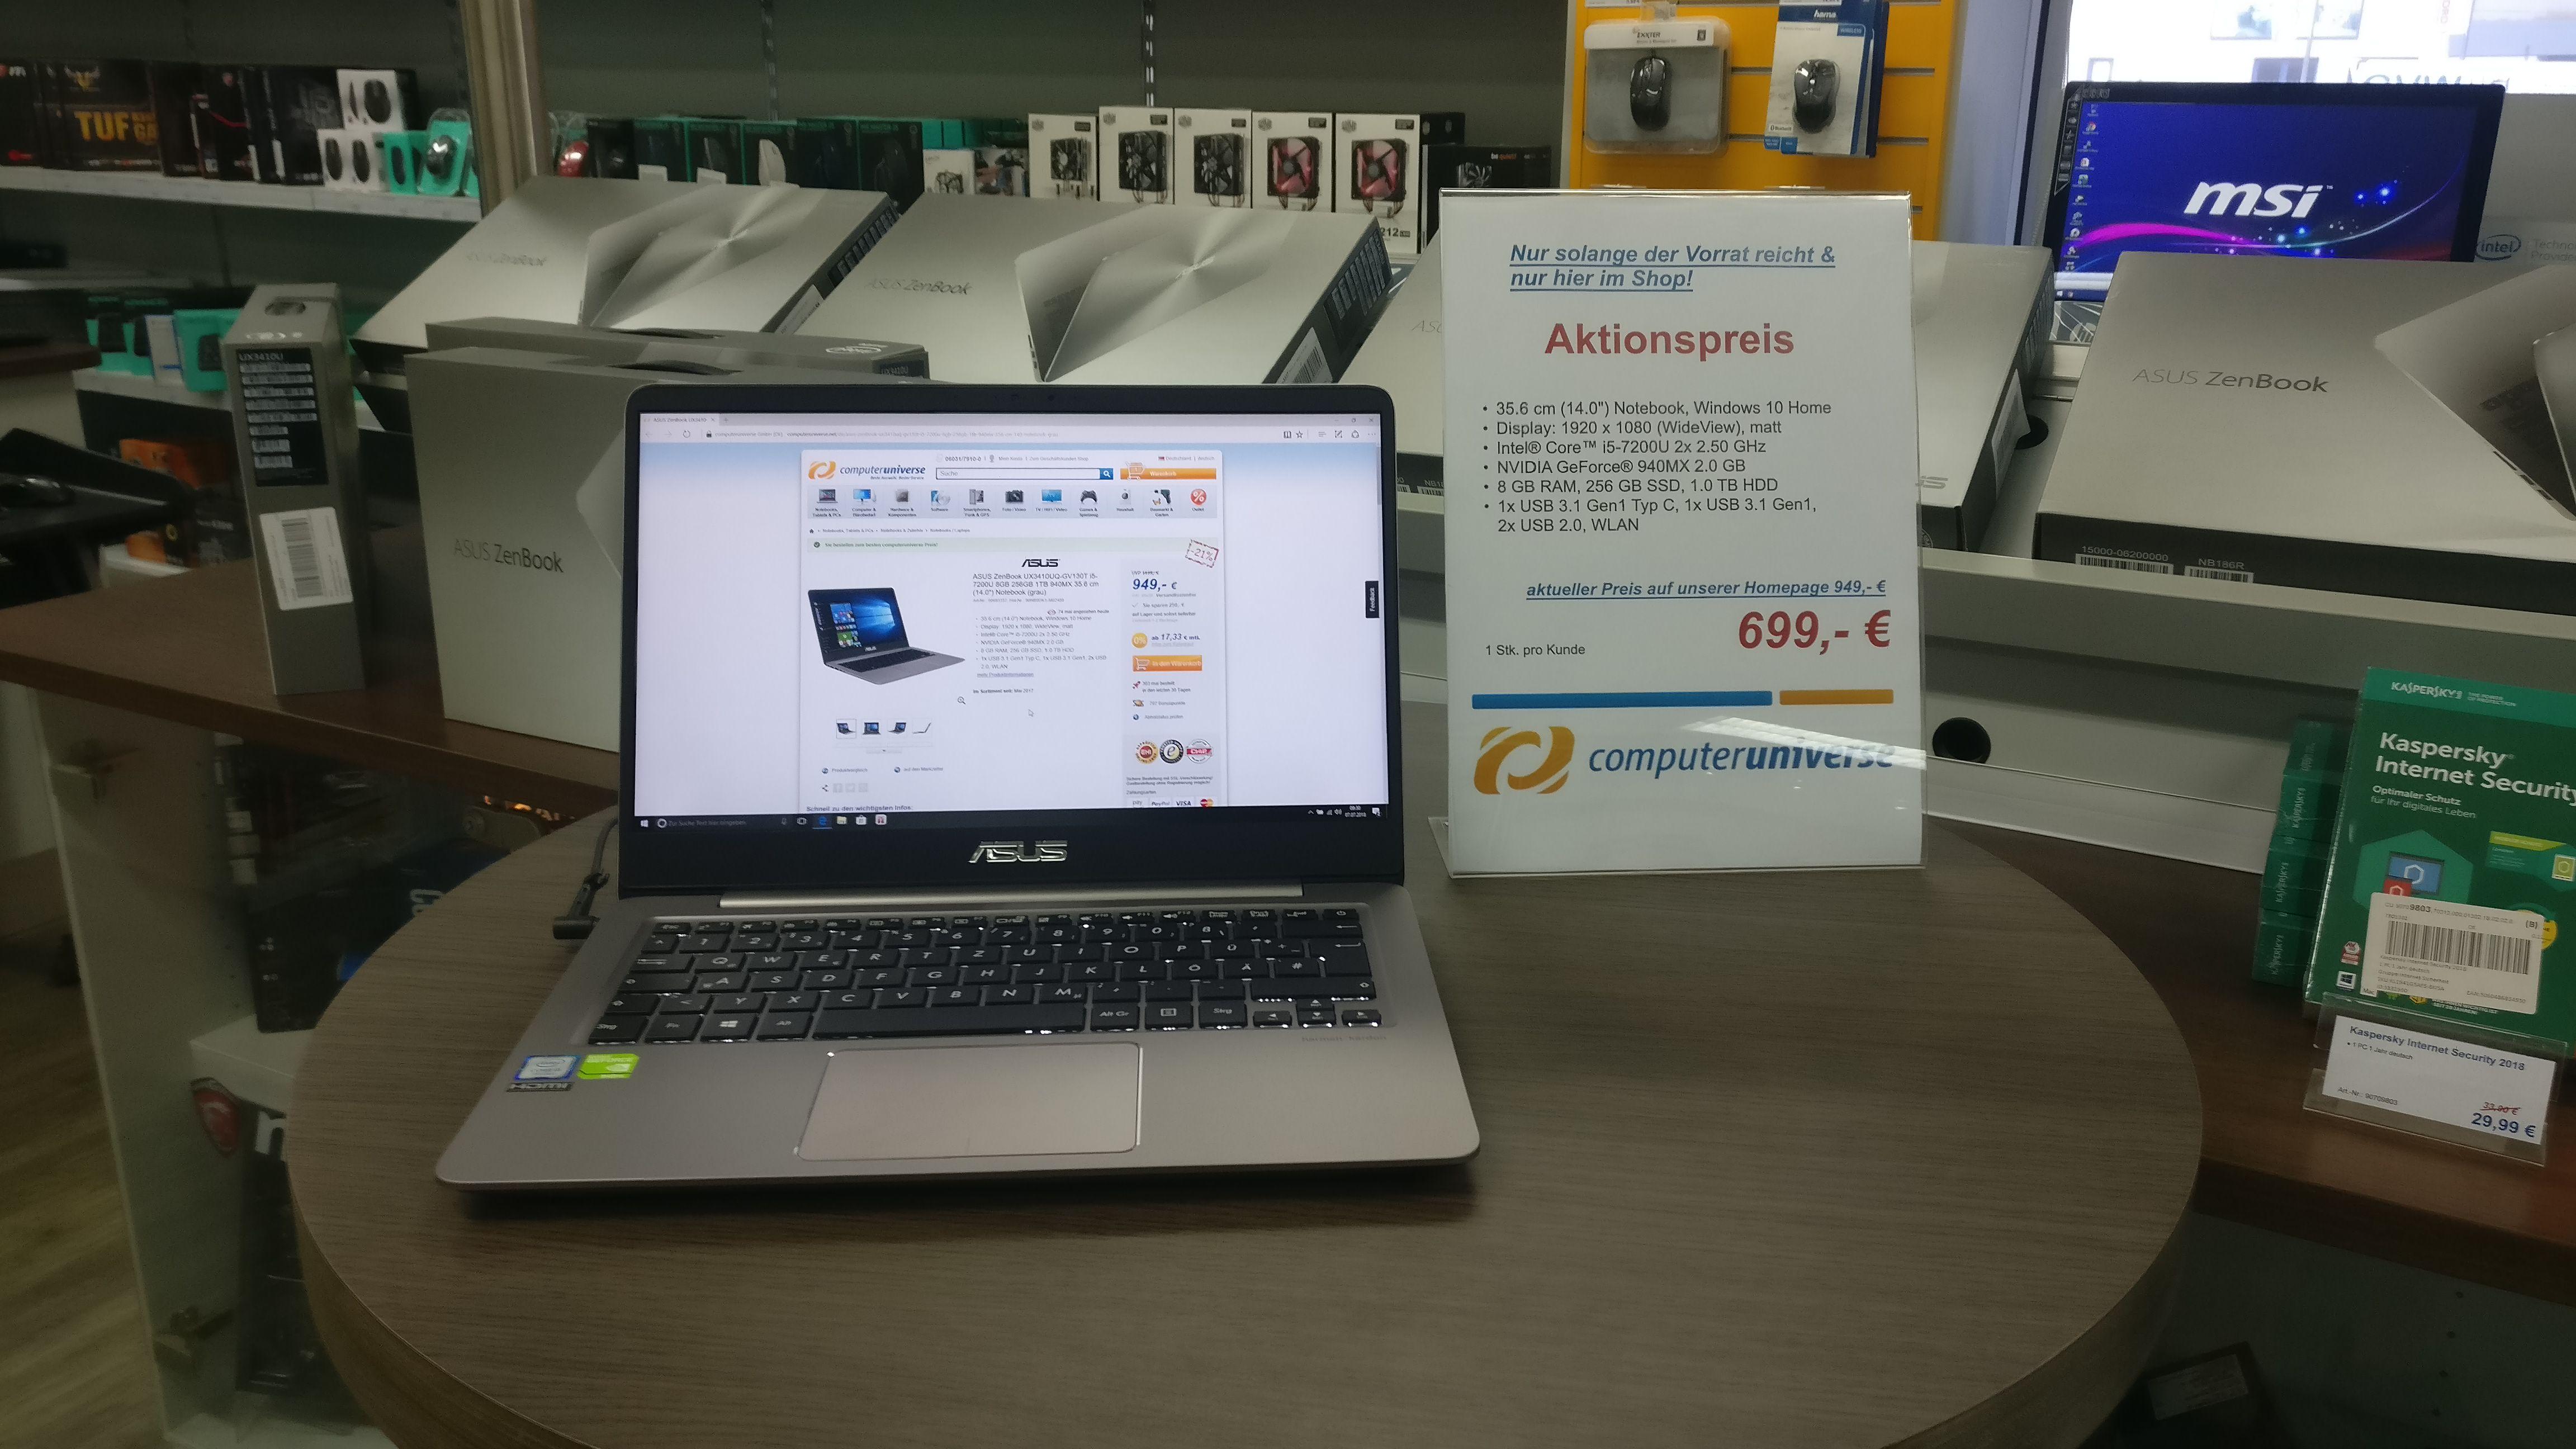 Asus ZenBook UX3410Q-GV140T in 61169 Friedberg